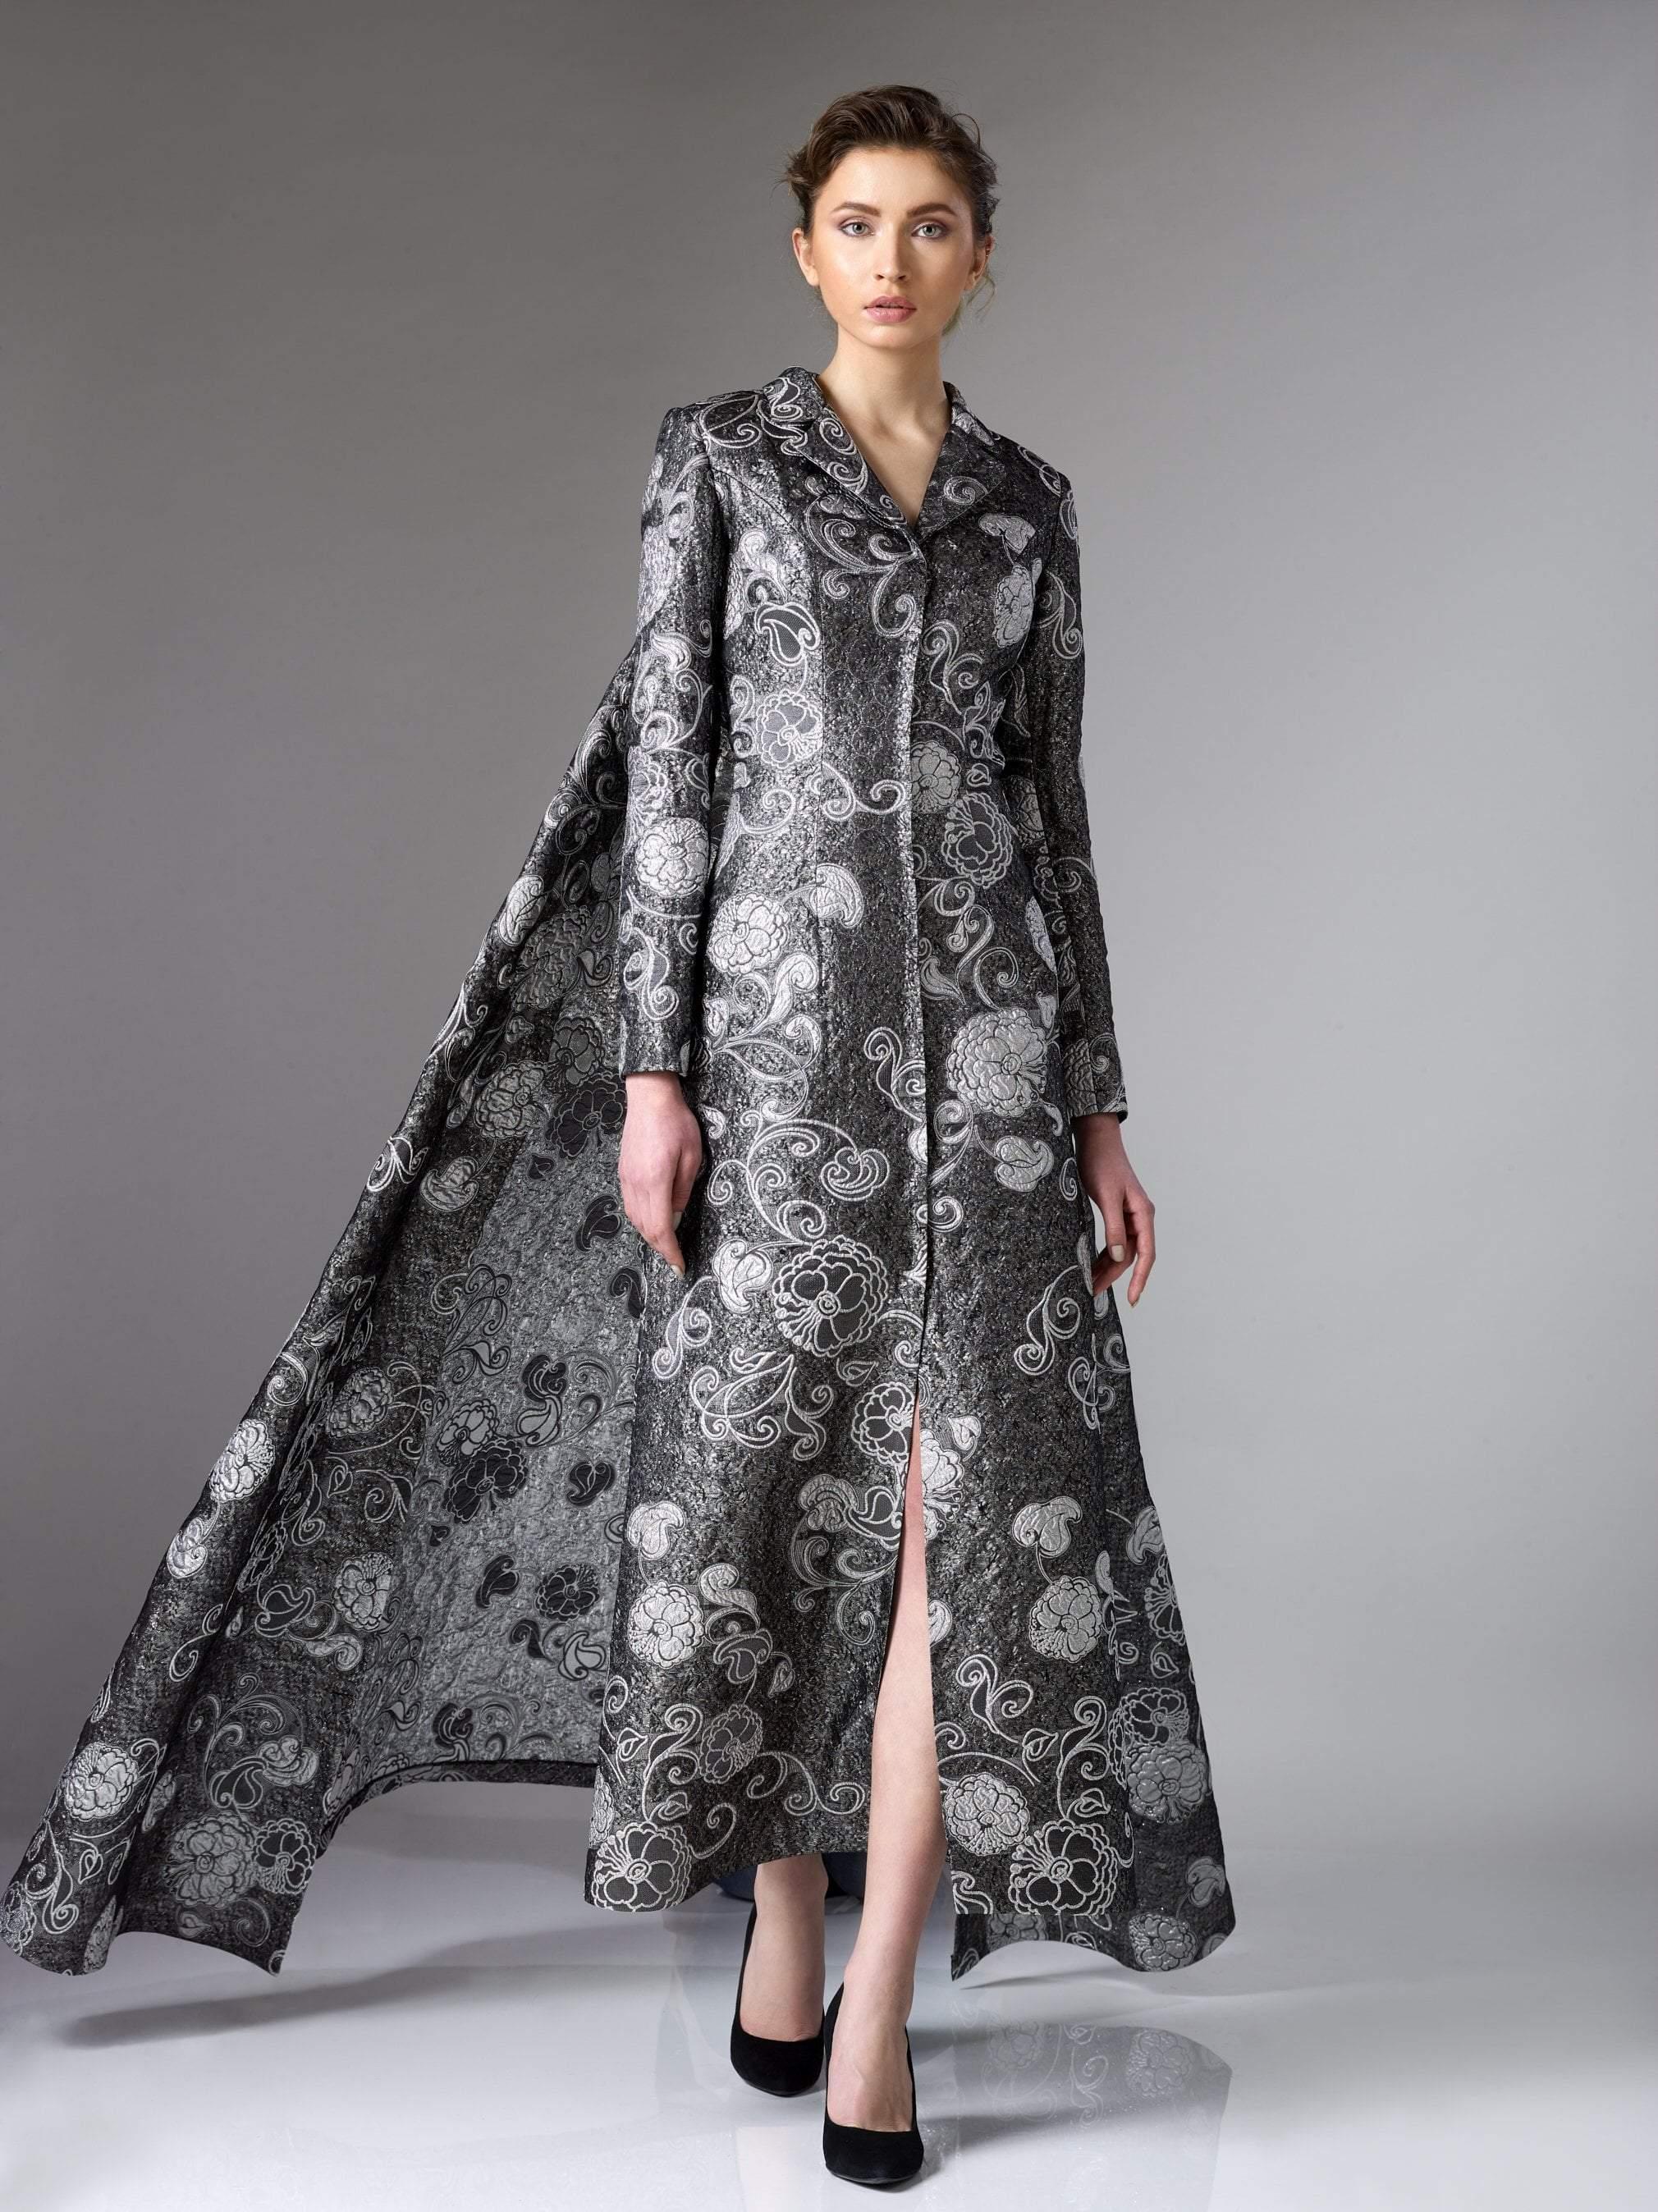 Edward Arsouni Couture - 316 Organza A-line Dress in Silver Black